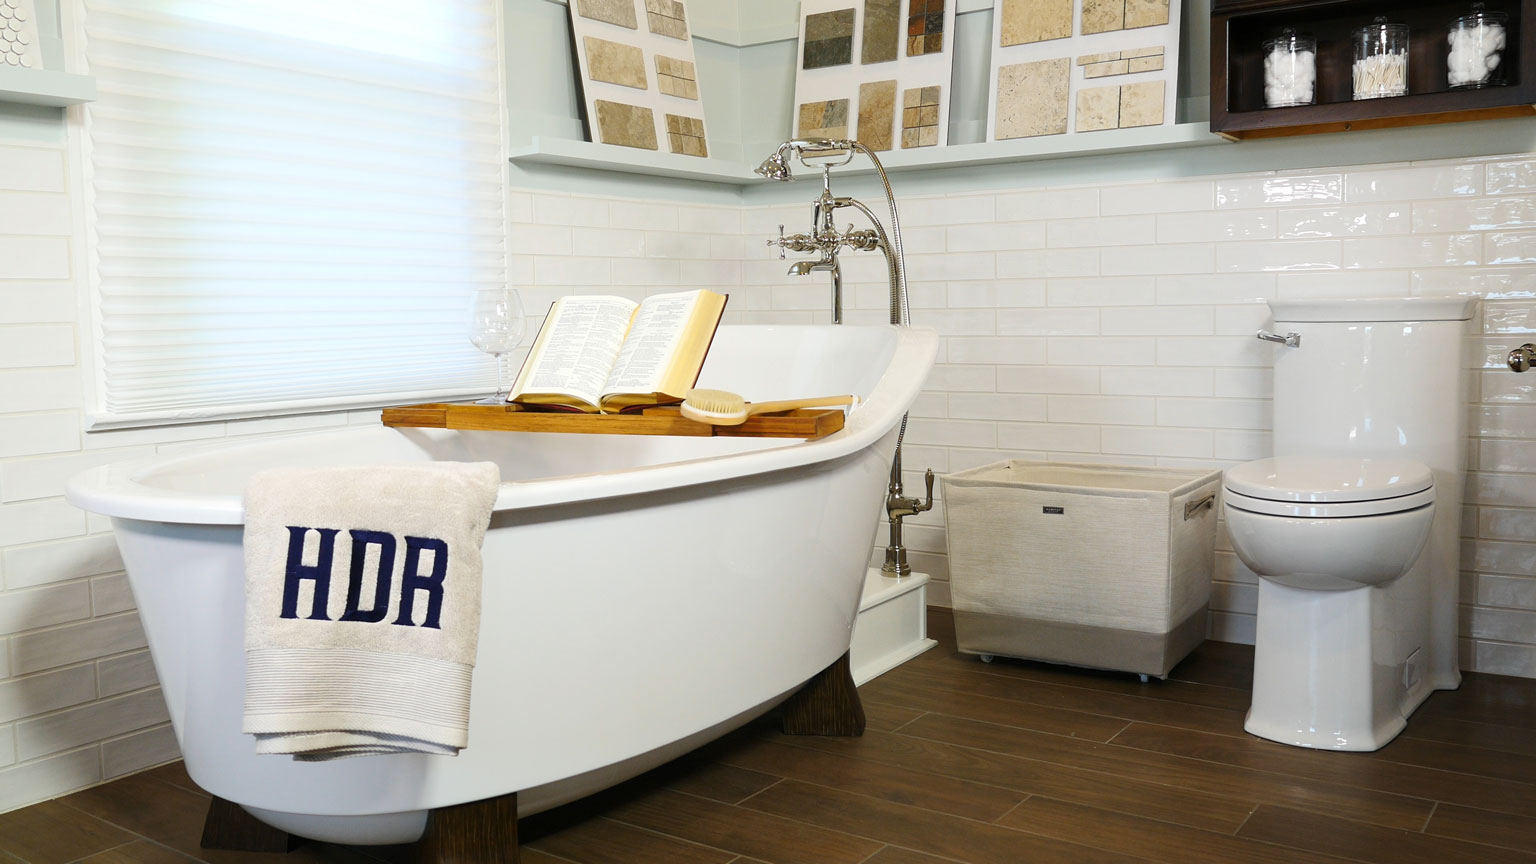 Gorgeous 25 bathroom showrooms virginia beach inspiration for Bathroom remodel virginia beach